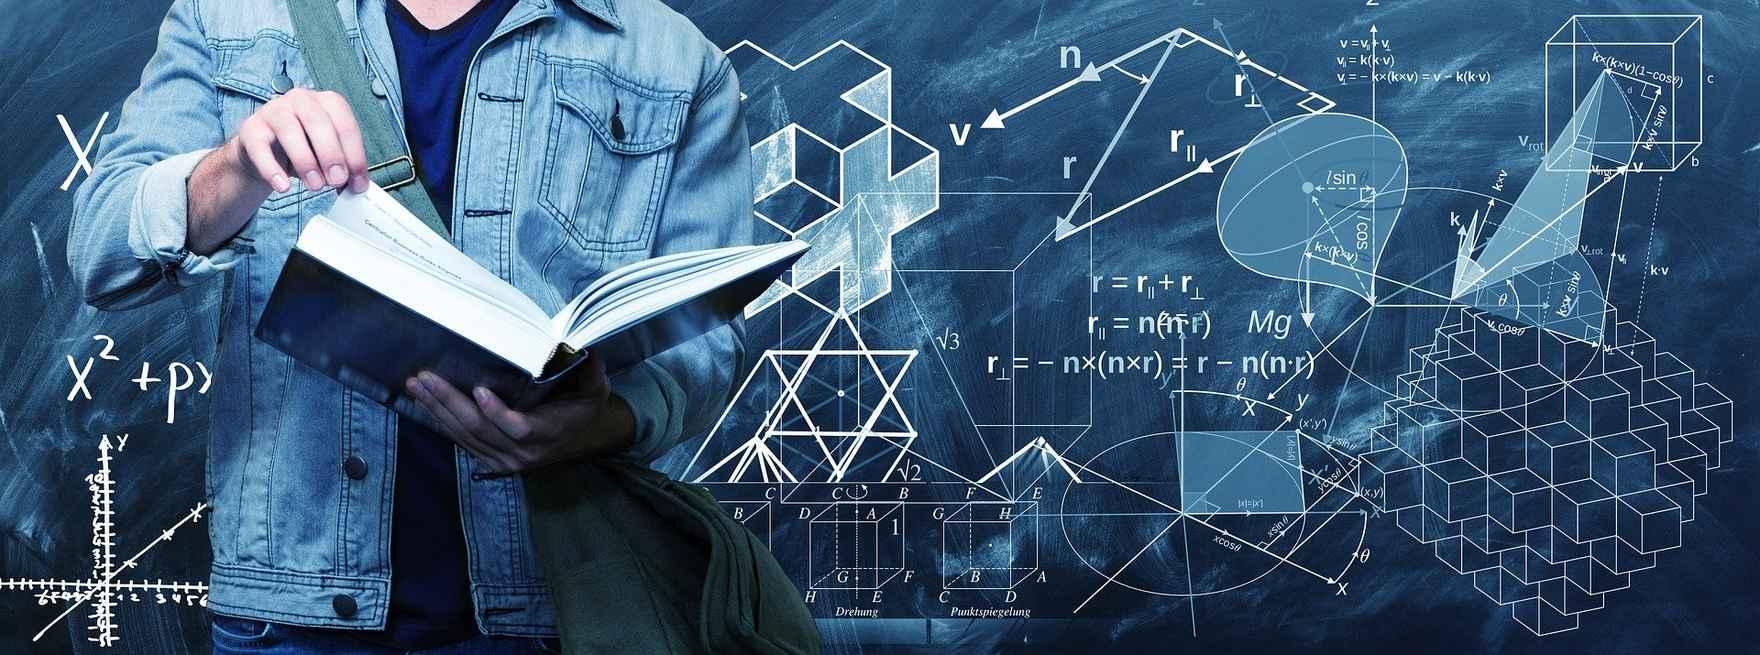 book physics board